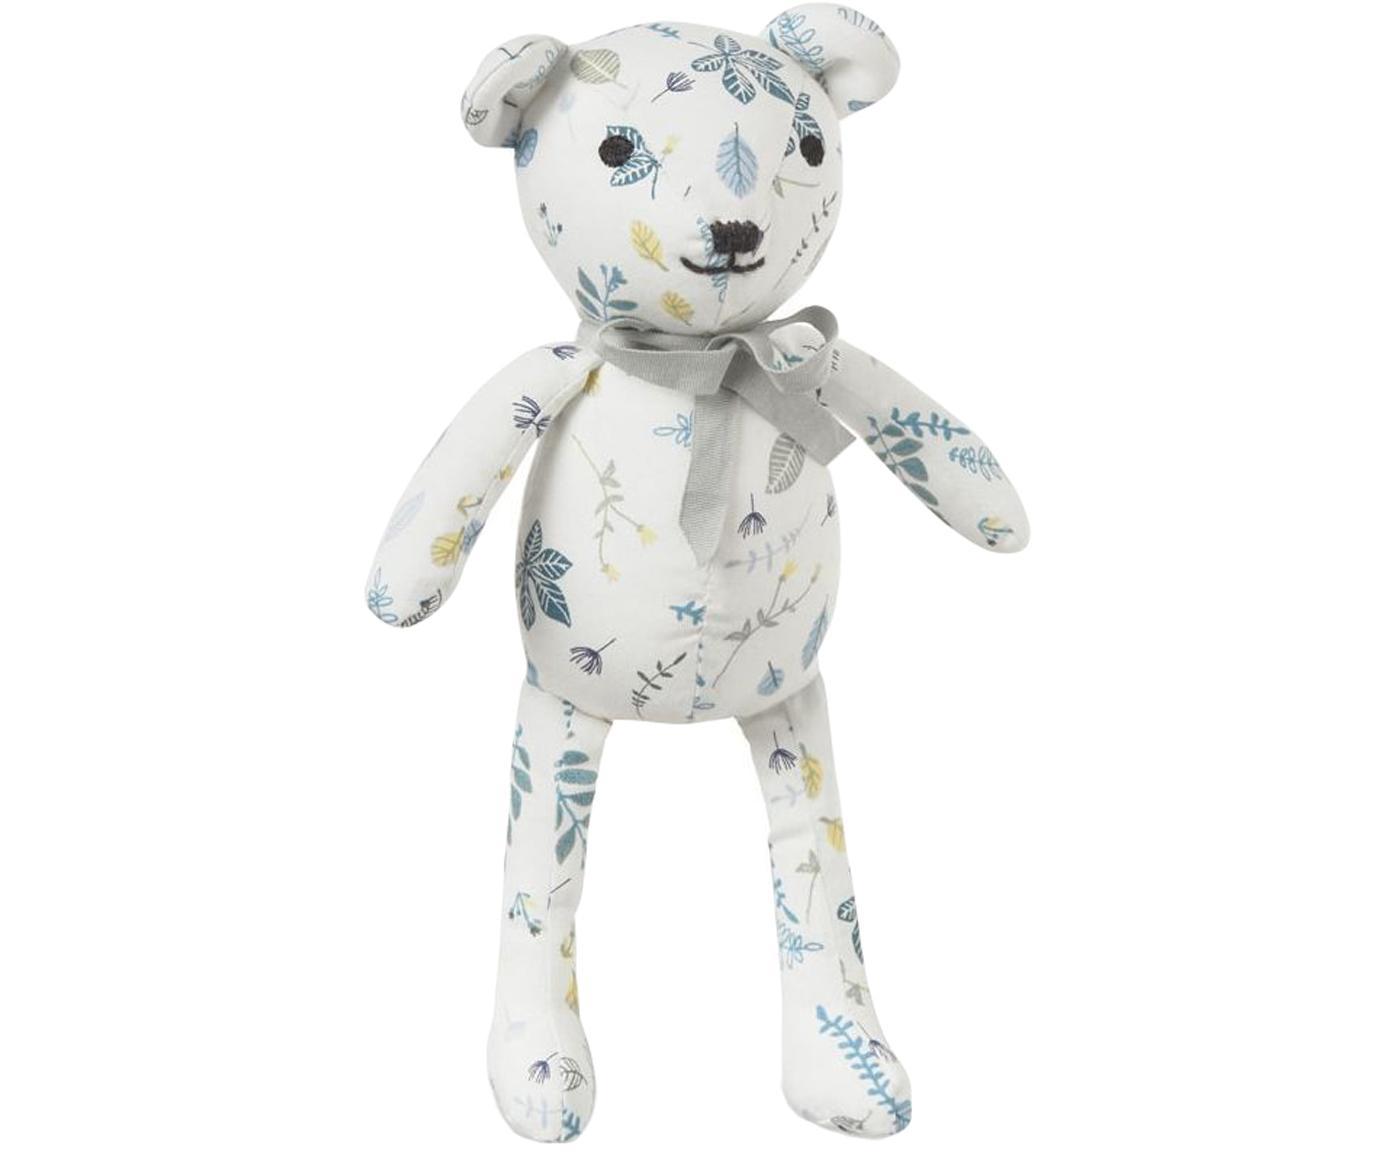 Peluche de algodón ecológico Teddy, Exterior: algodón ecológico, certif, Blanco, tonos azules, amarillo, An 14 x Al 28 cm